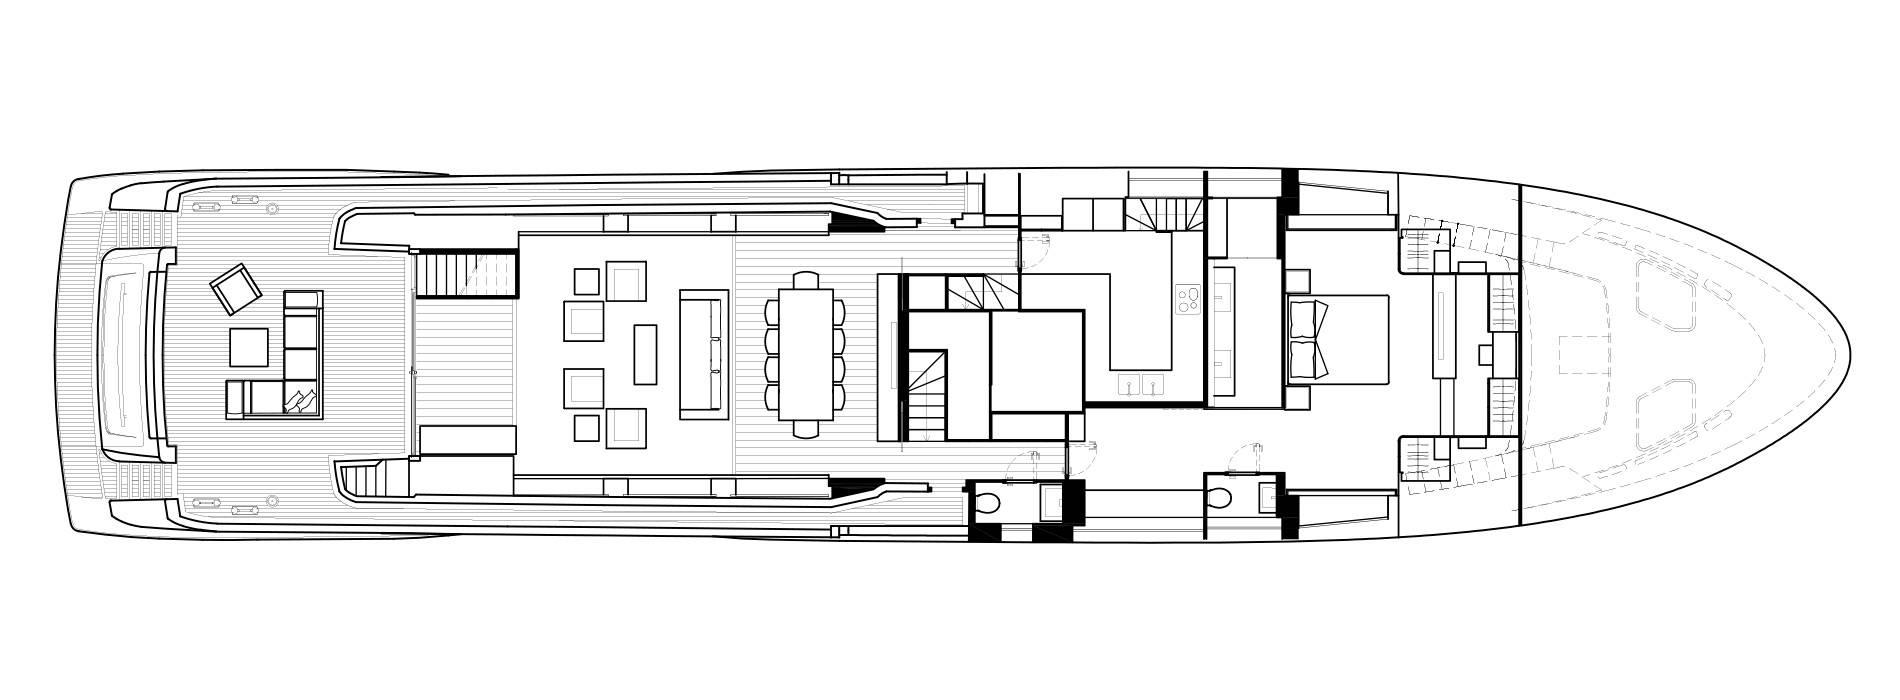 Sanlorenzo Yachts SL118 Главная палуба